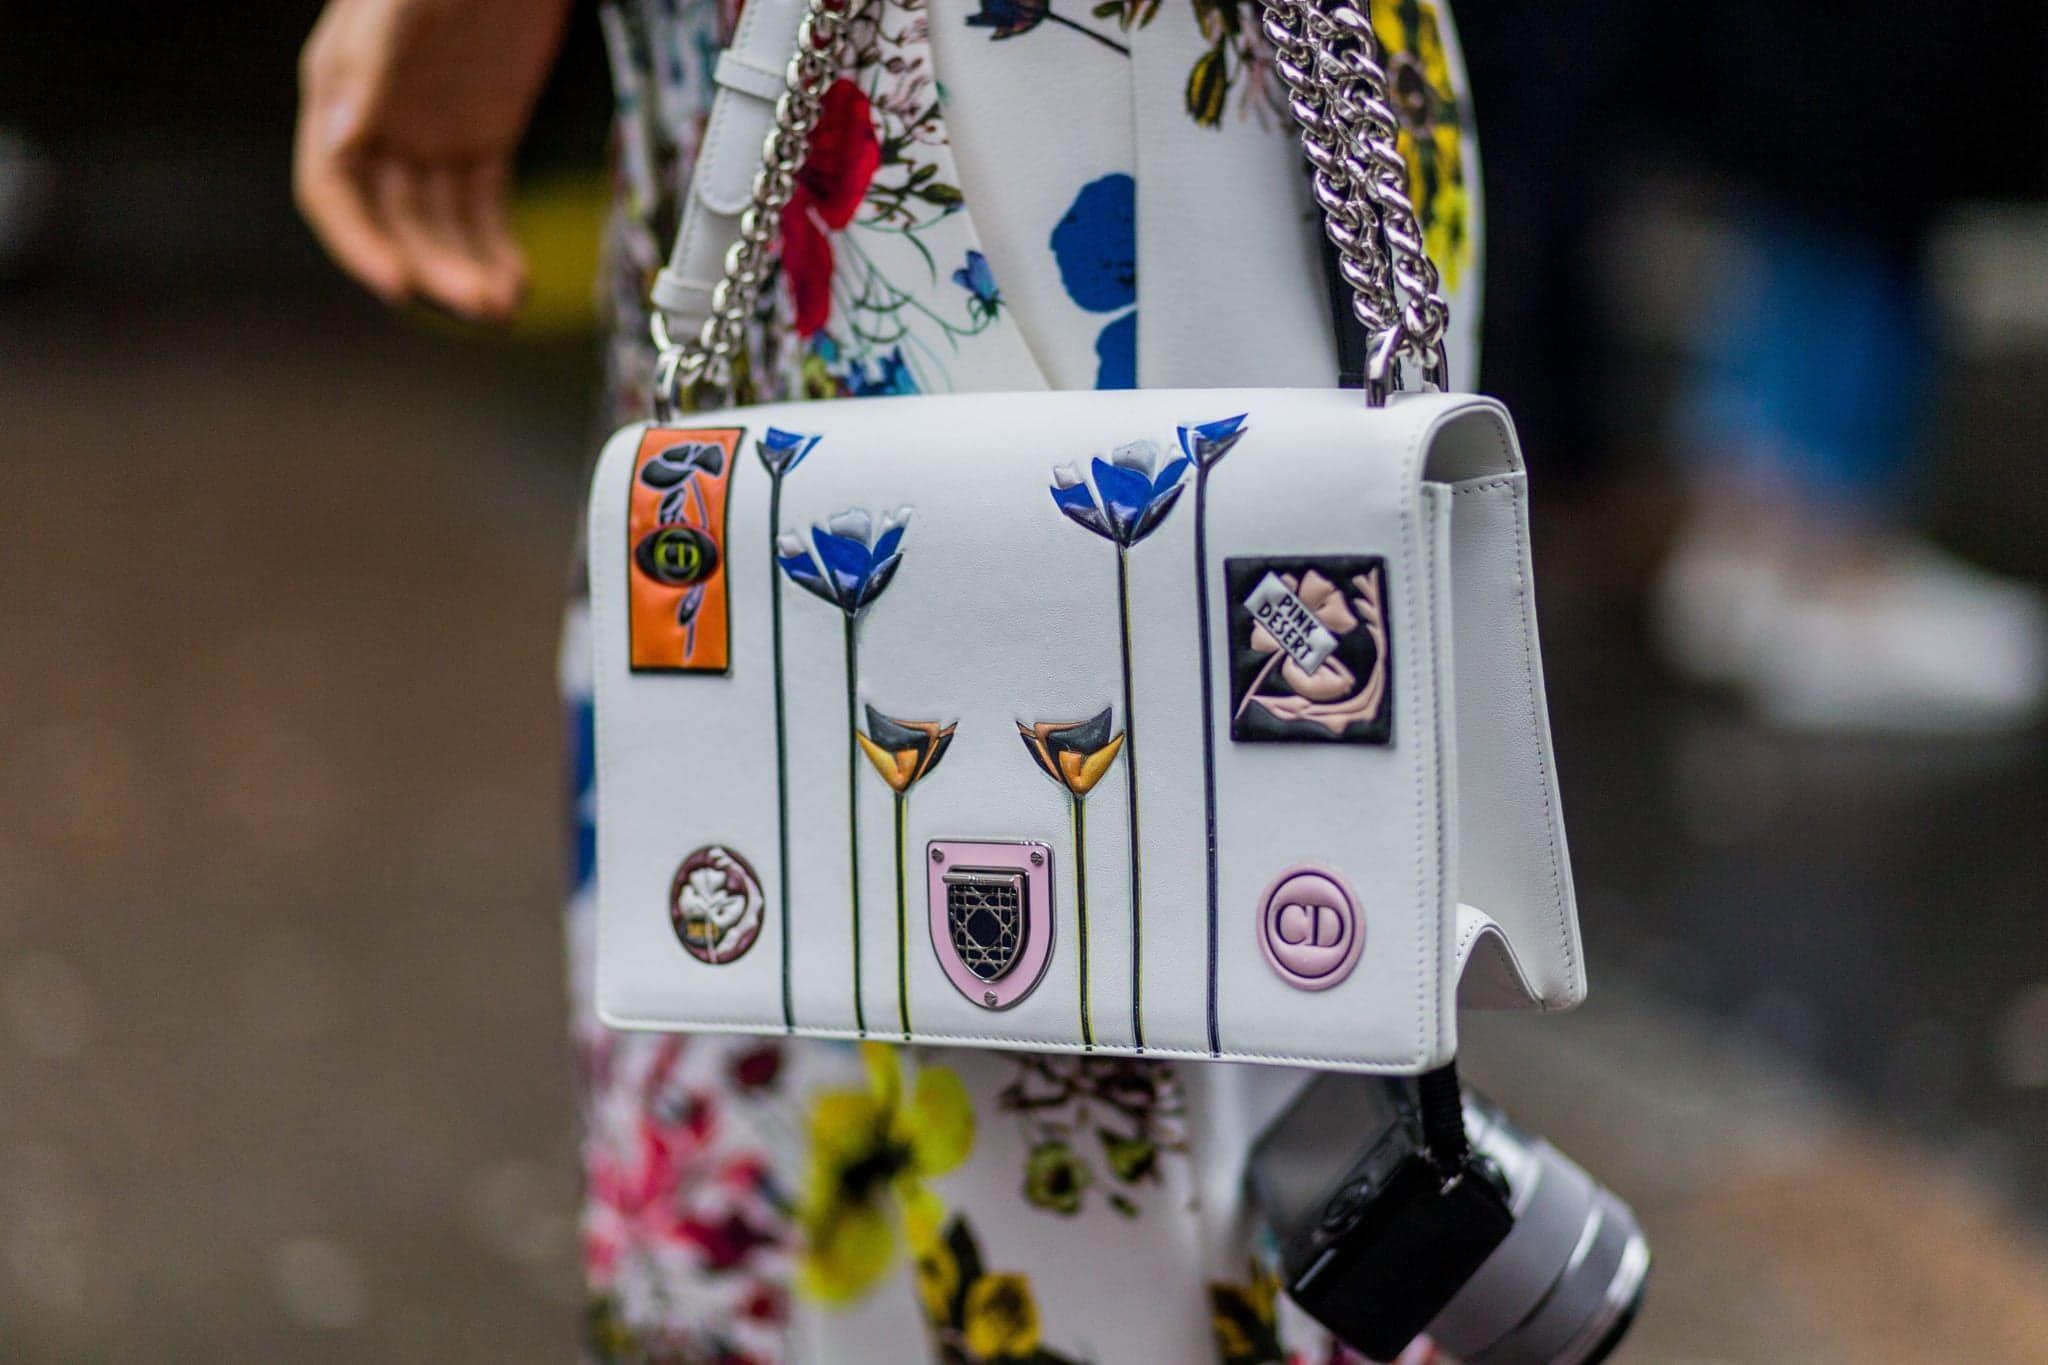 Street style. Dior purse